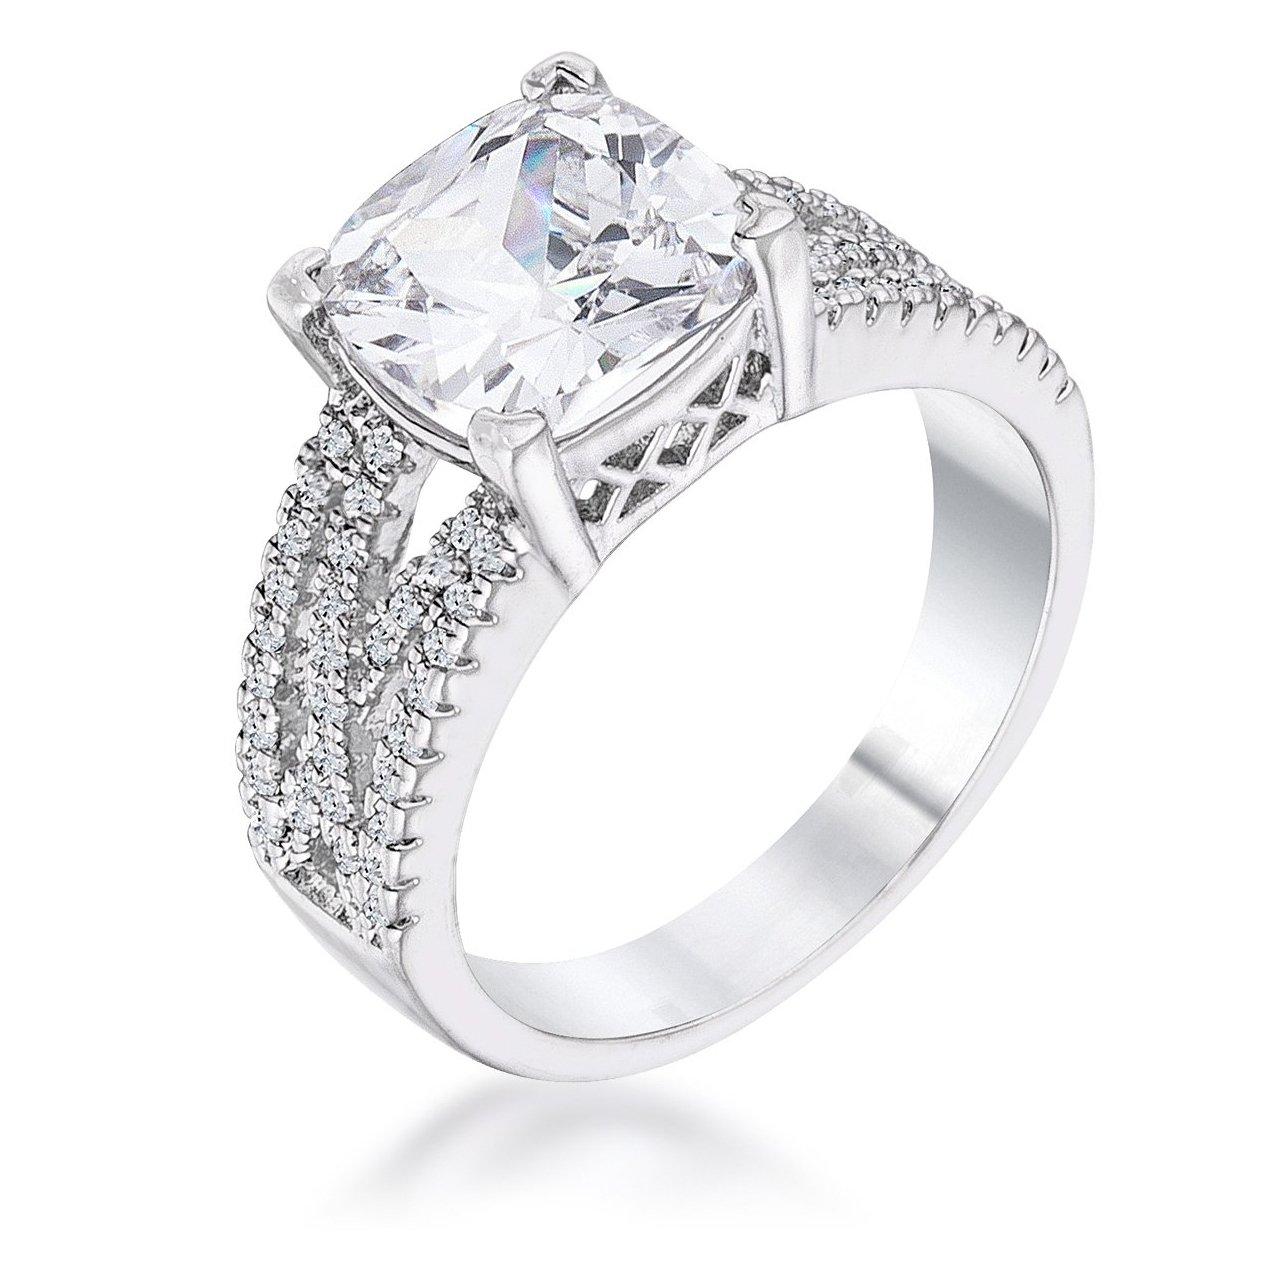 3ct Elegant Rhodium Plated Criss Cross Clear Cz Engagement Ring